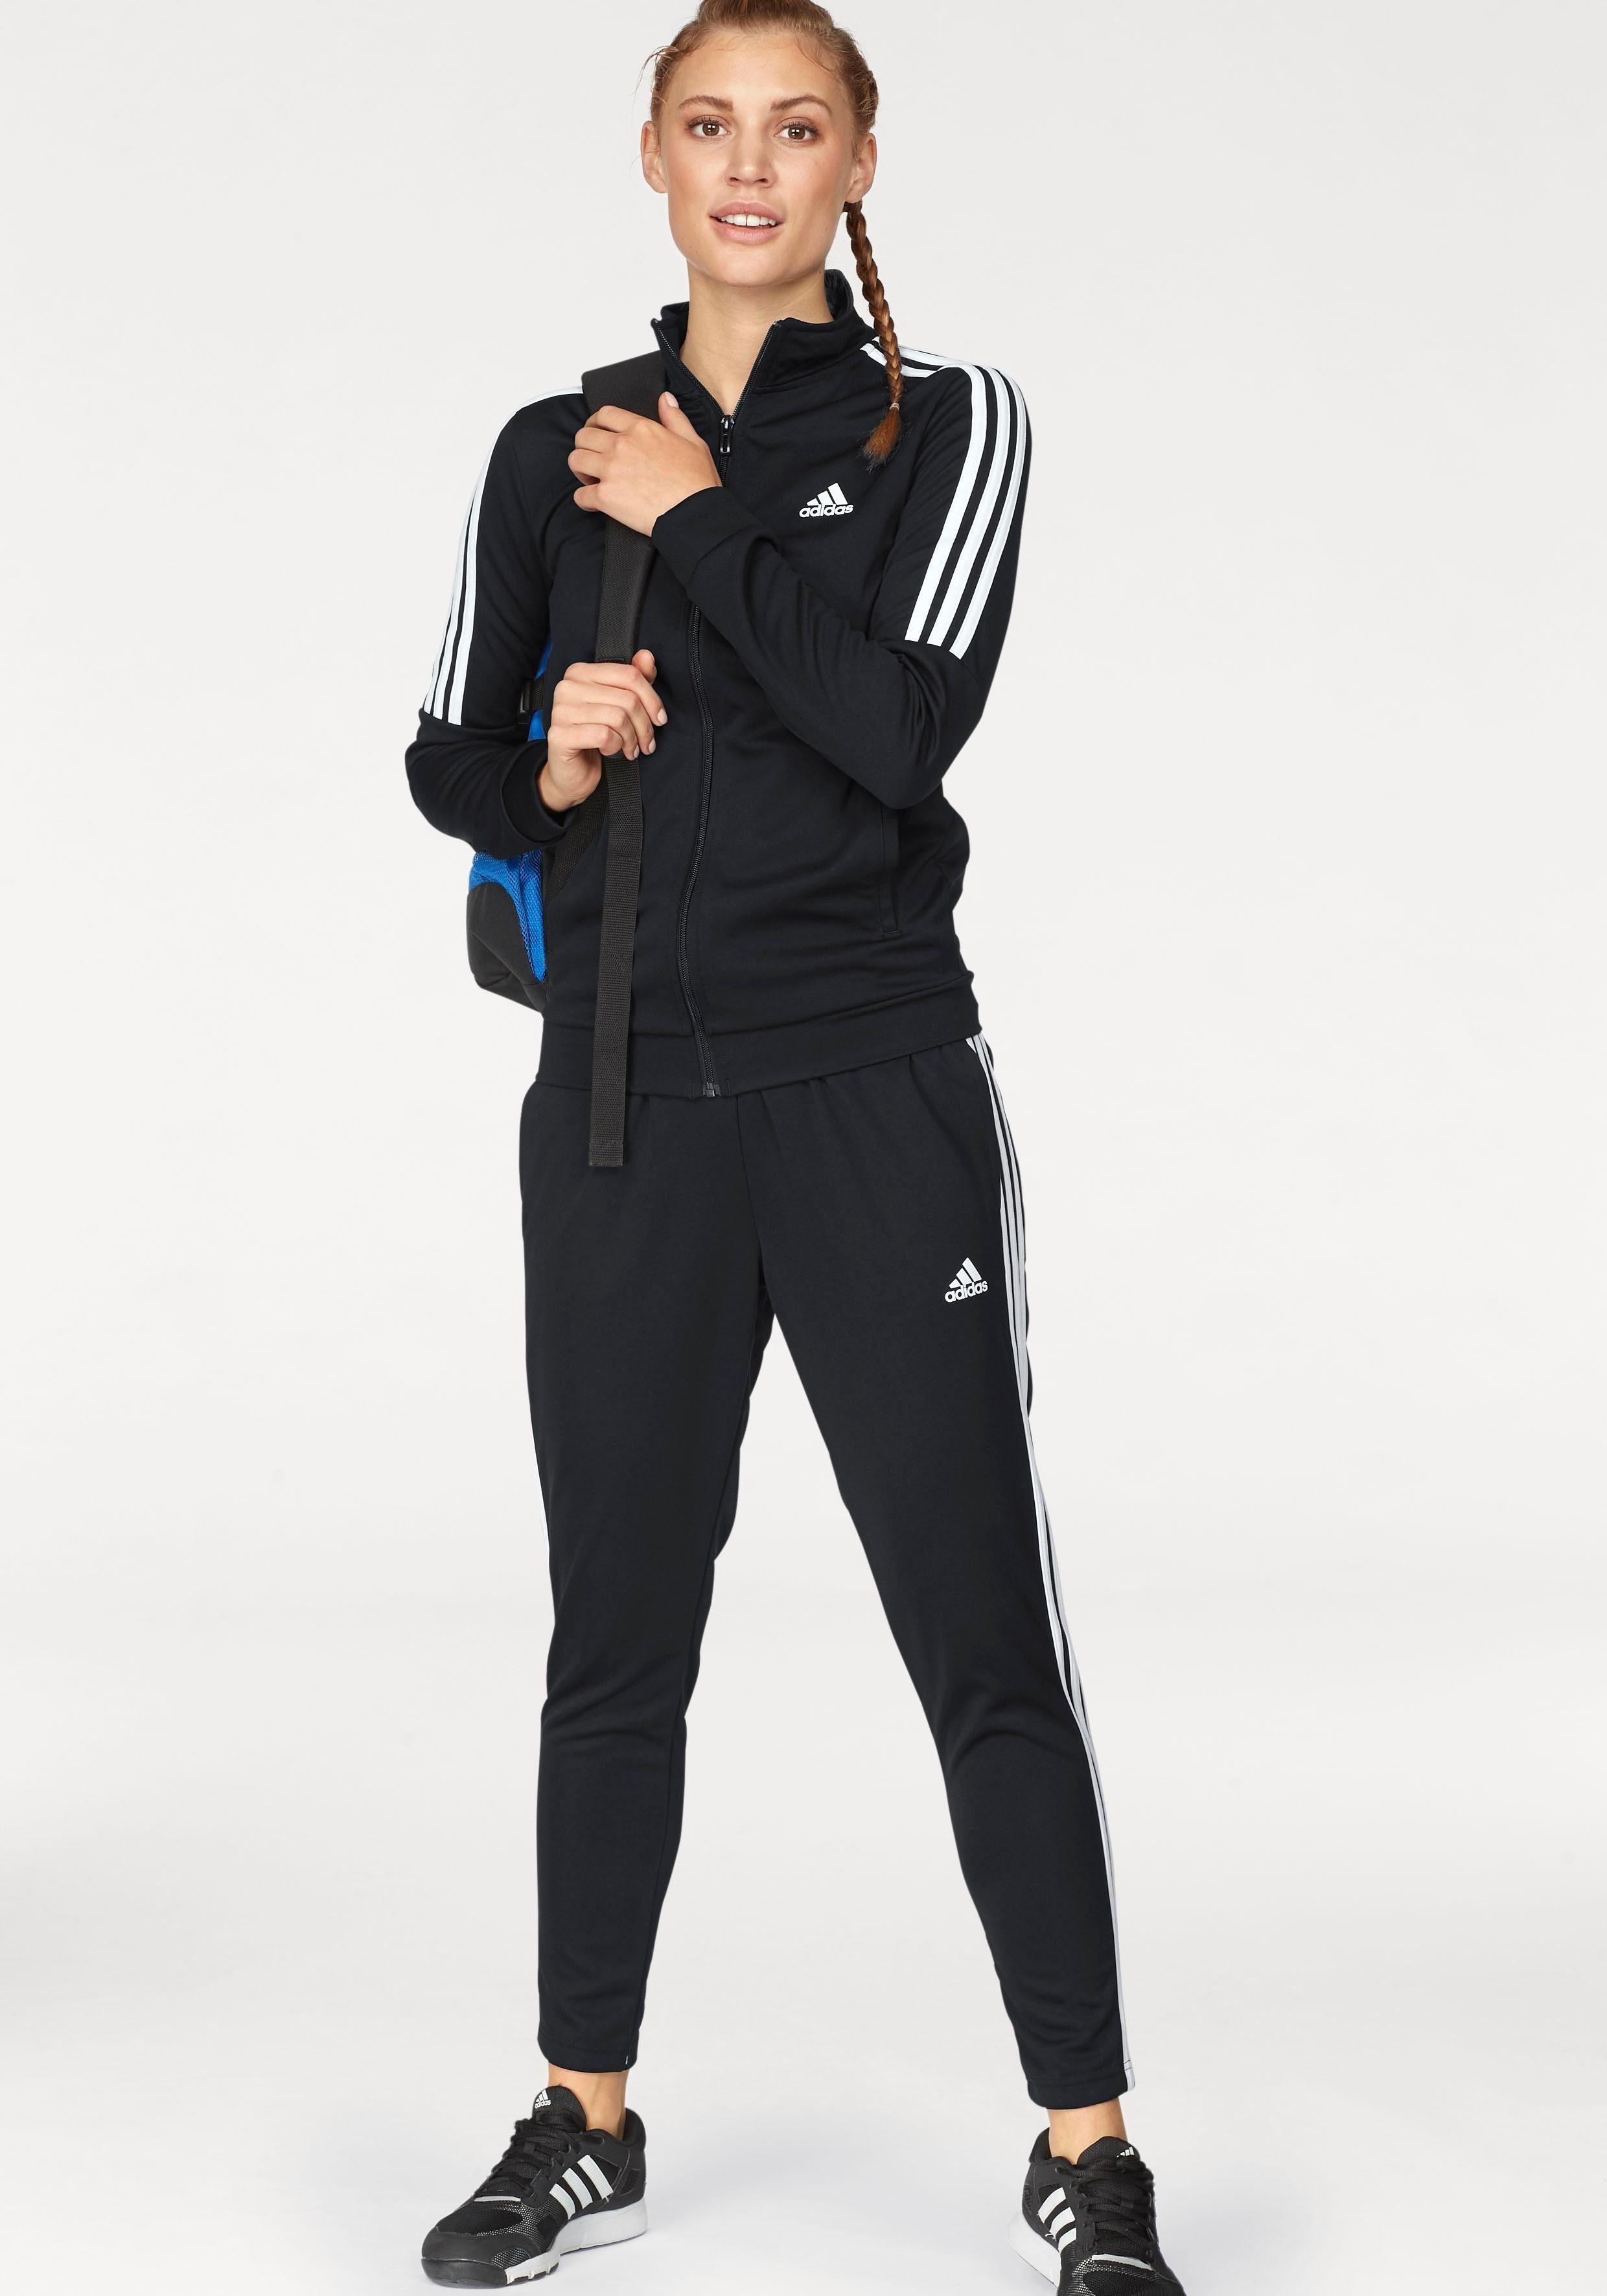 adidas Performance Trainingsanzug, Logodruck online kaufen | OTTO